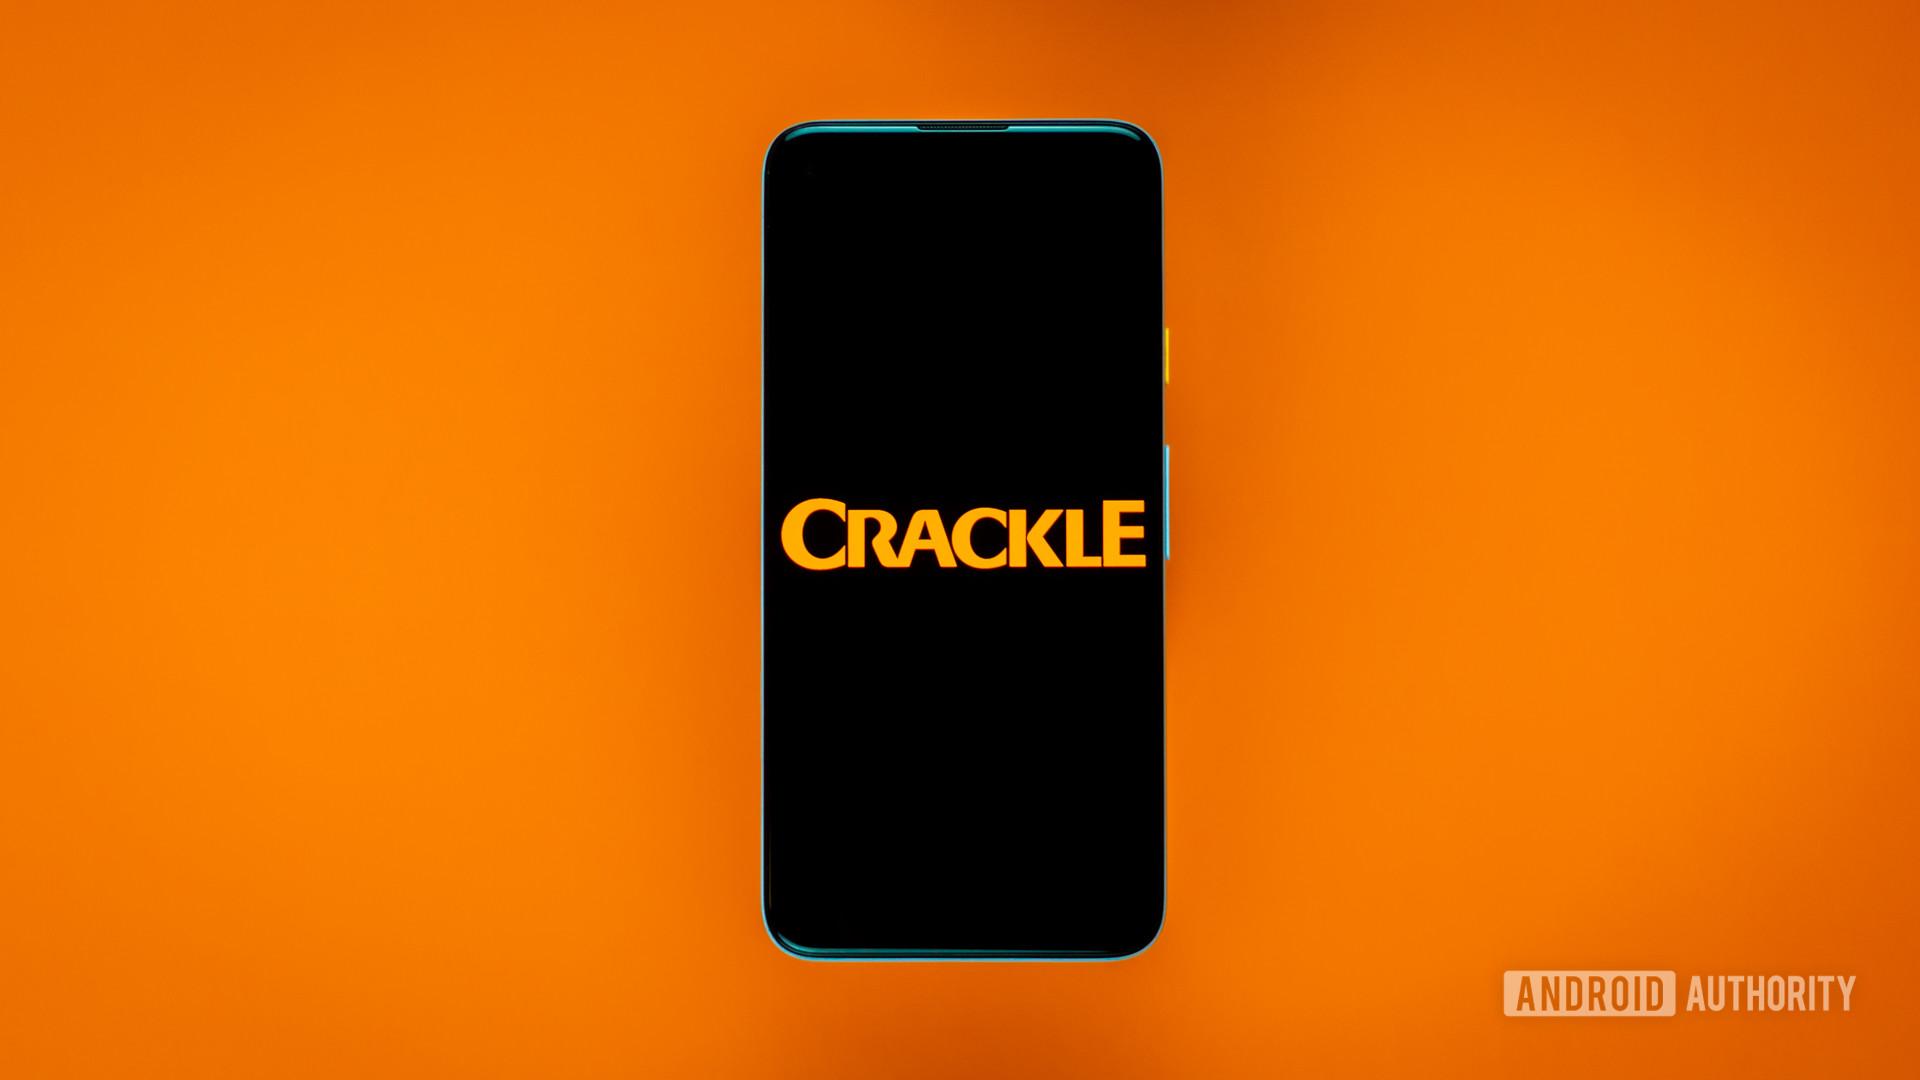 Crackle stock photo 1